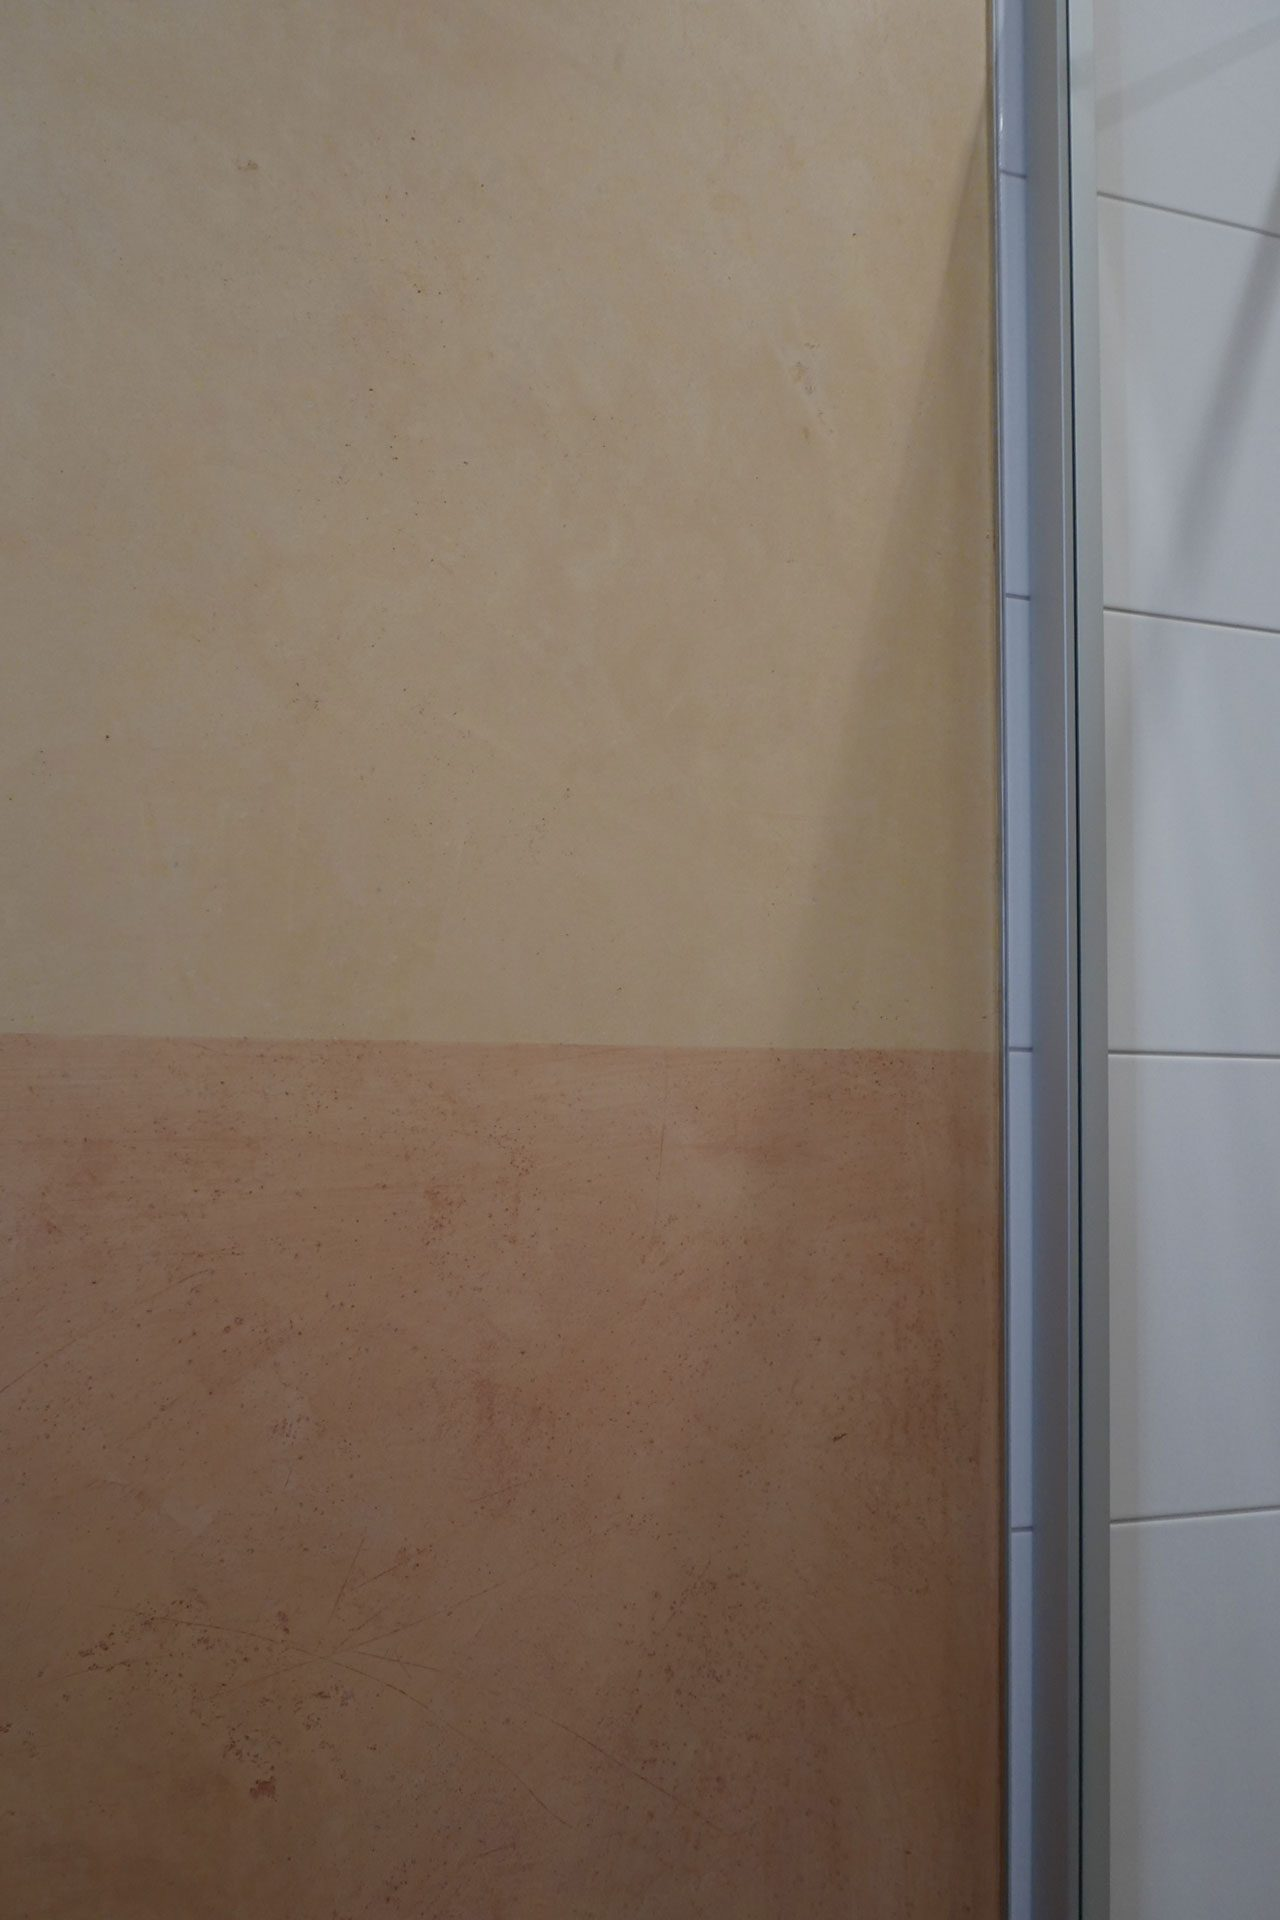 KalkManufaktur Premium Sumpfkalk Marmorputz Sockel farbig verseift